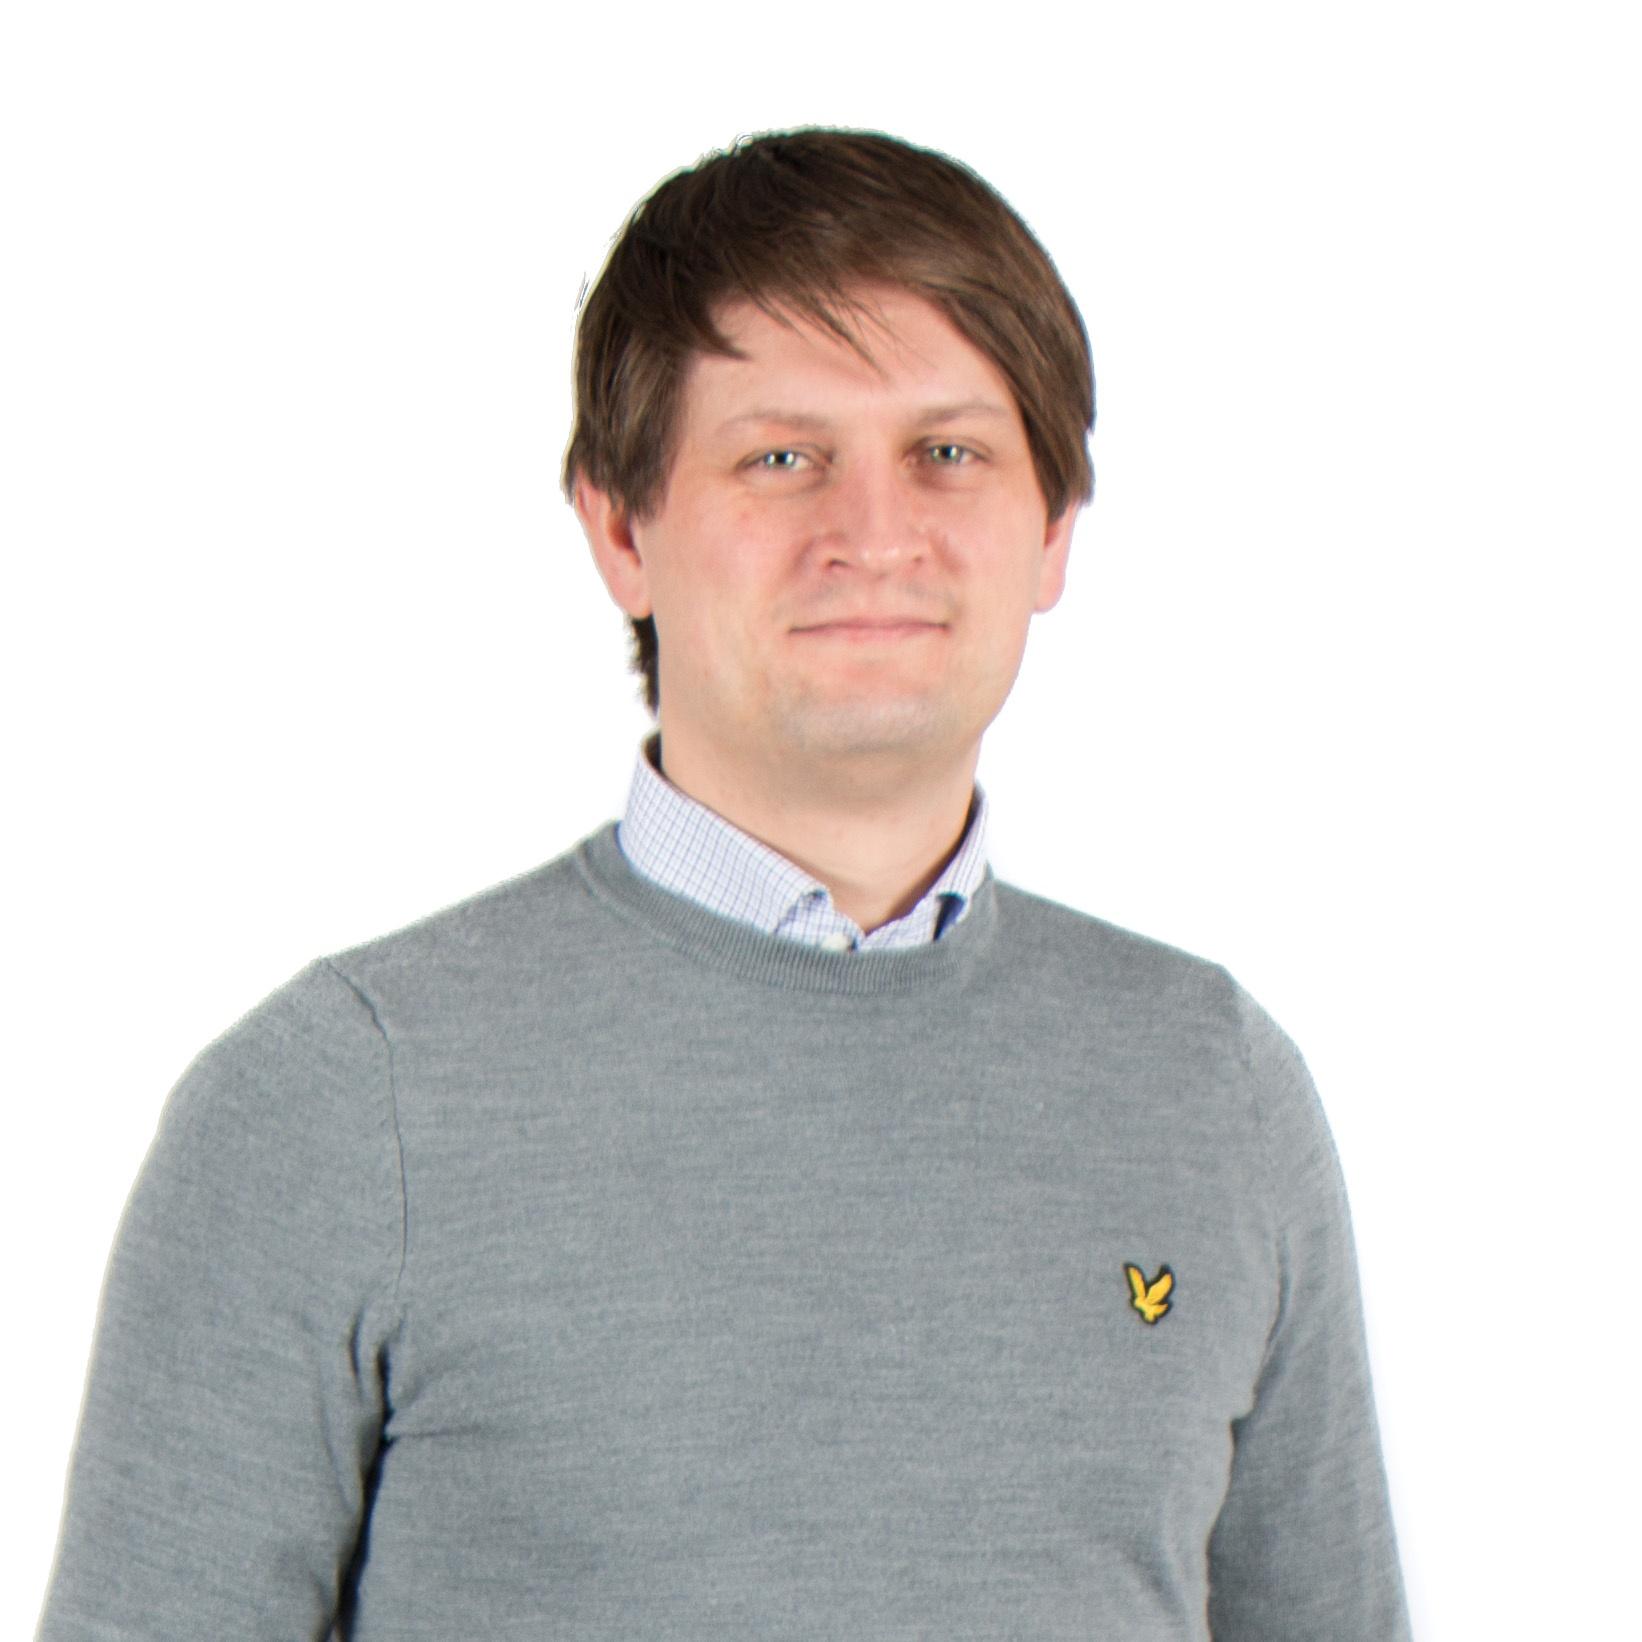 Mats Chr. Sandvig's photo